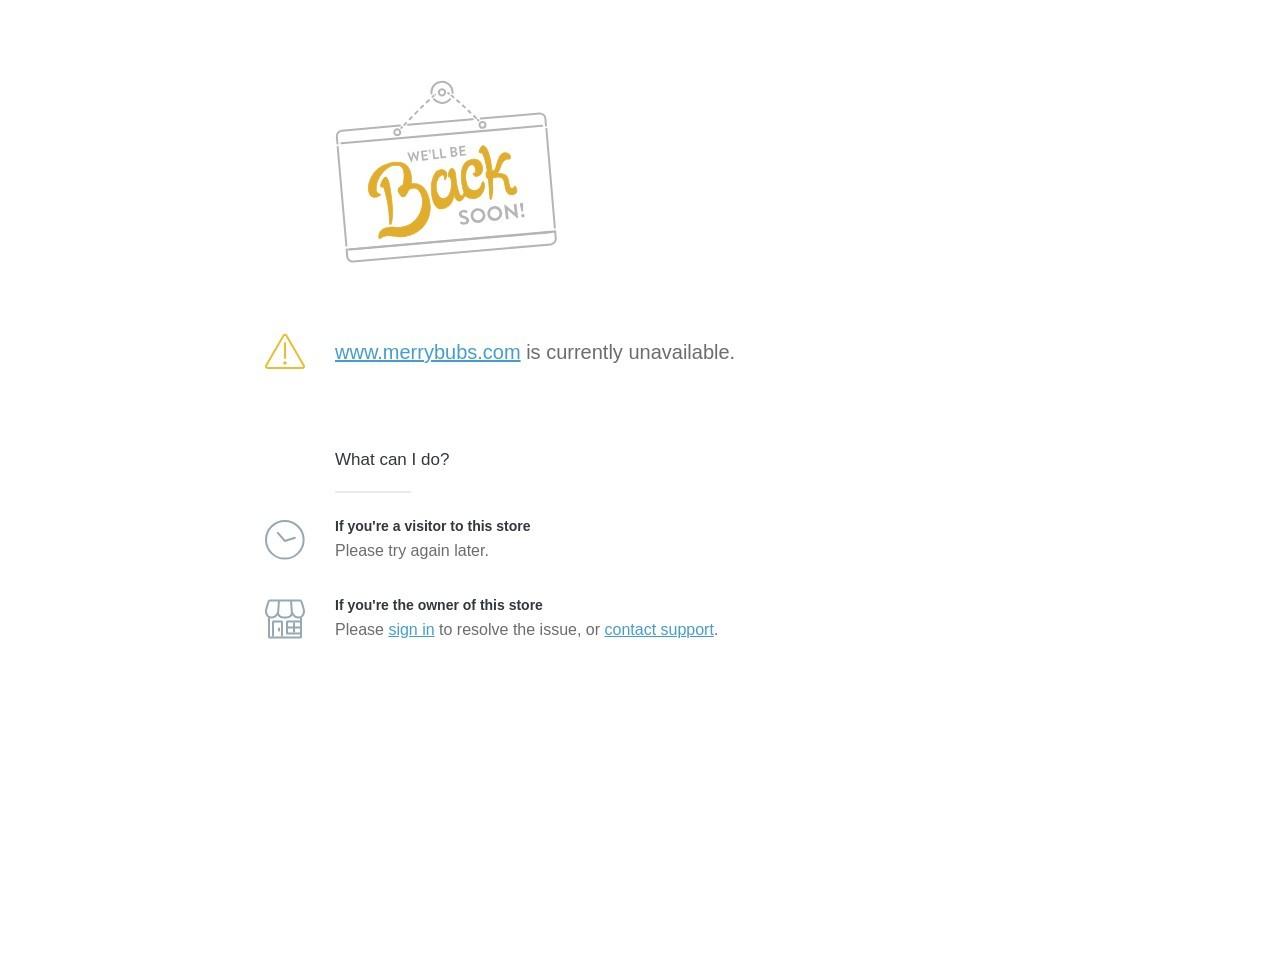 merrybubs.com